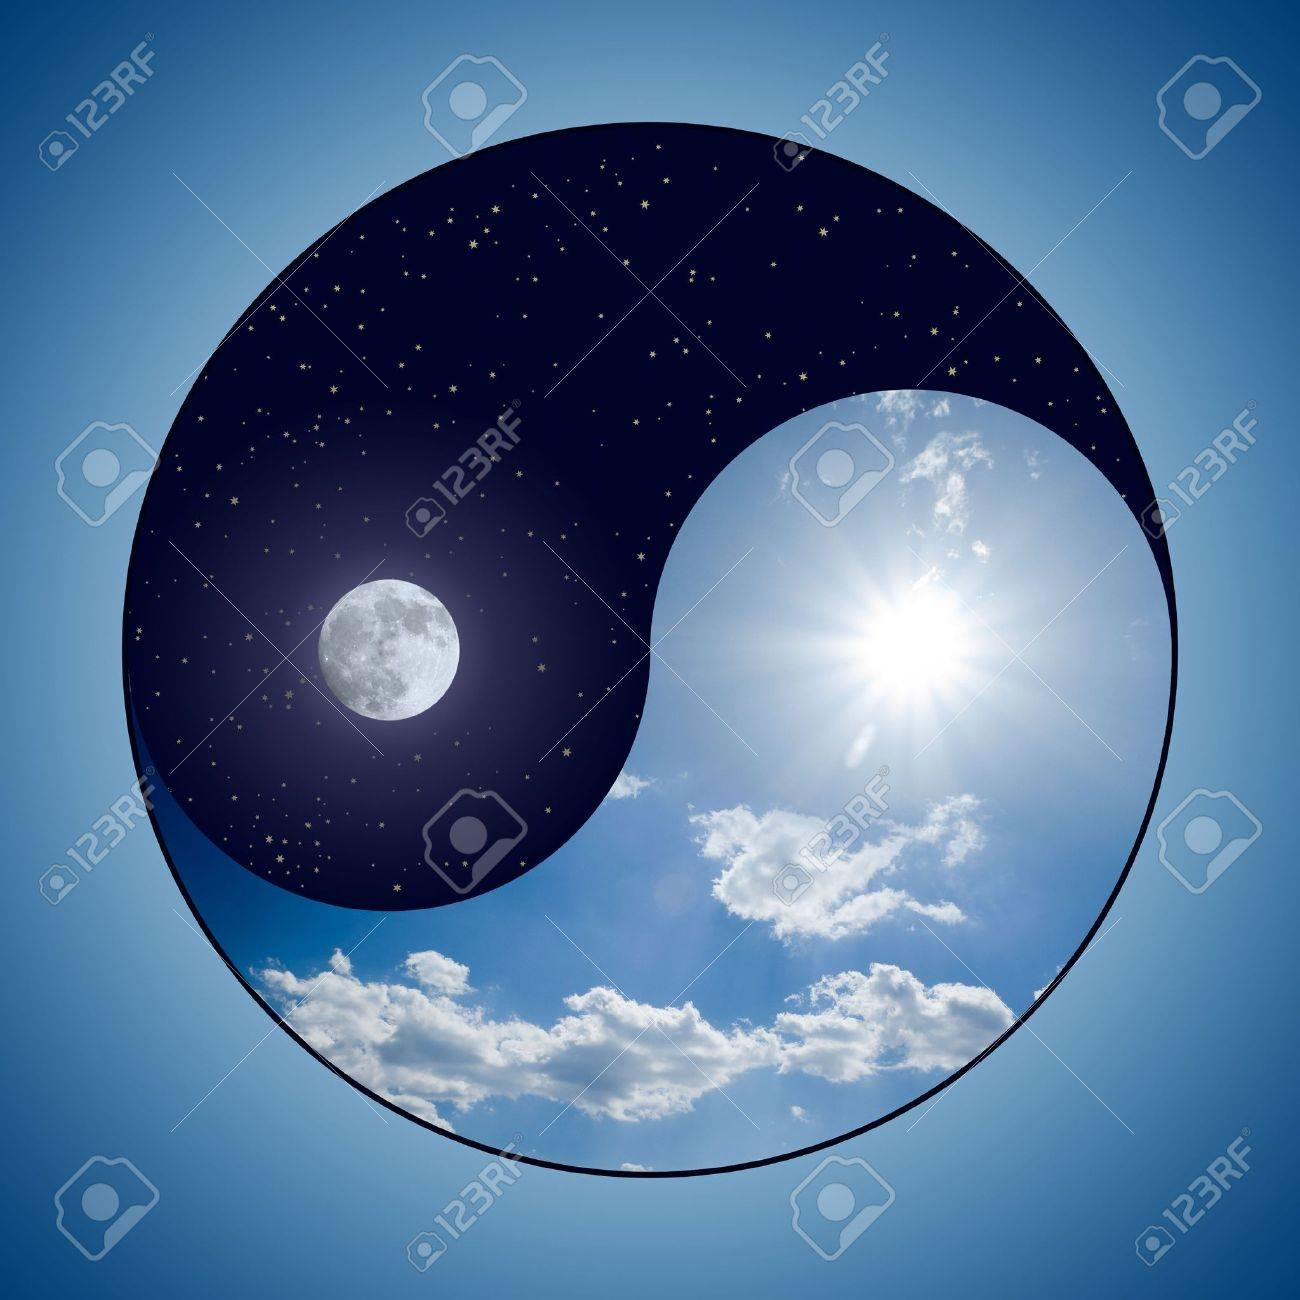 Modified Yin & Yang symbol - sunny day versus moon at night Stock Photo - 3705880